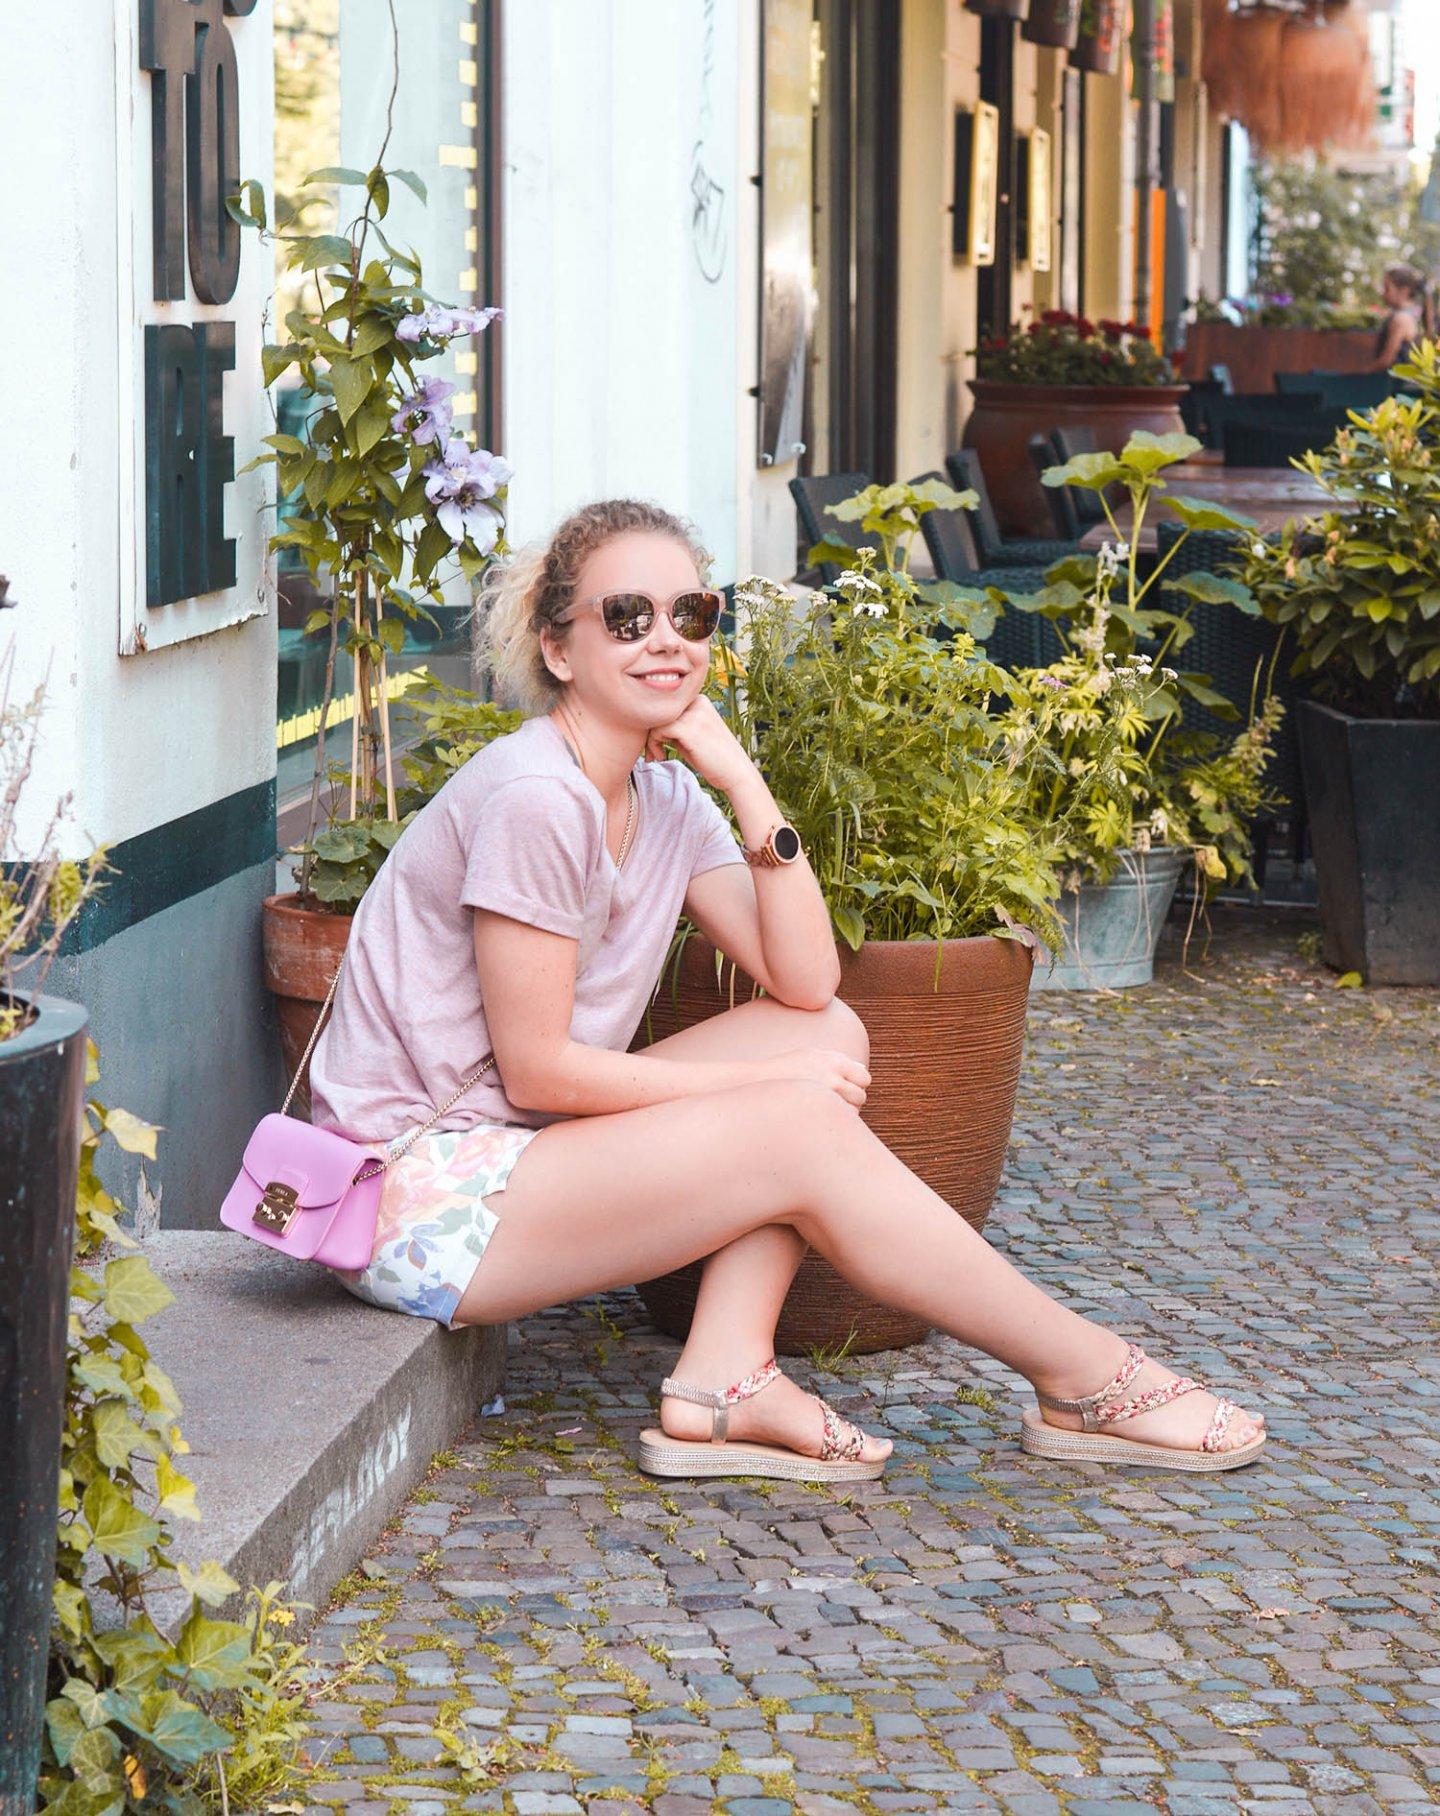 Sommerliche Kombi in Rosa in prenzlauer berg, Berlin